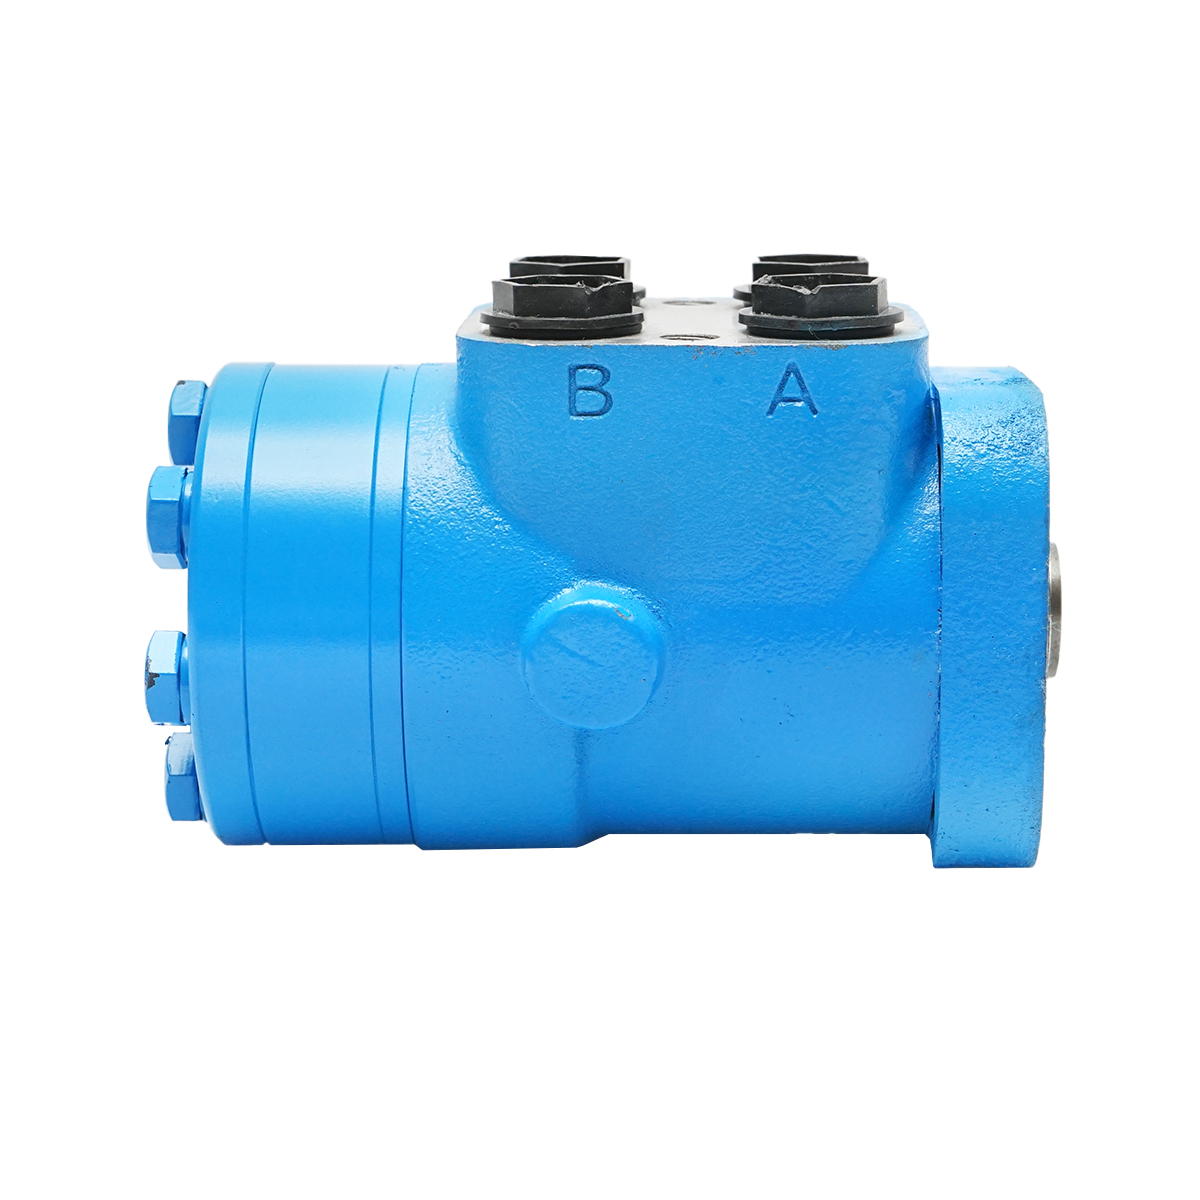 Pompa hidraulica danfoss 160 PSI G1/2 (inch) kit servodirectie UTB 650